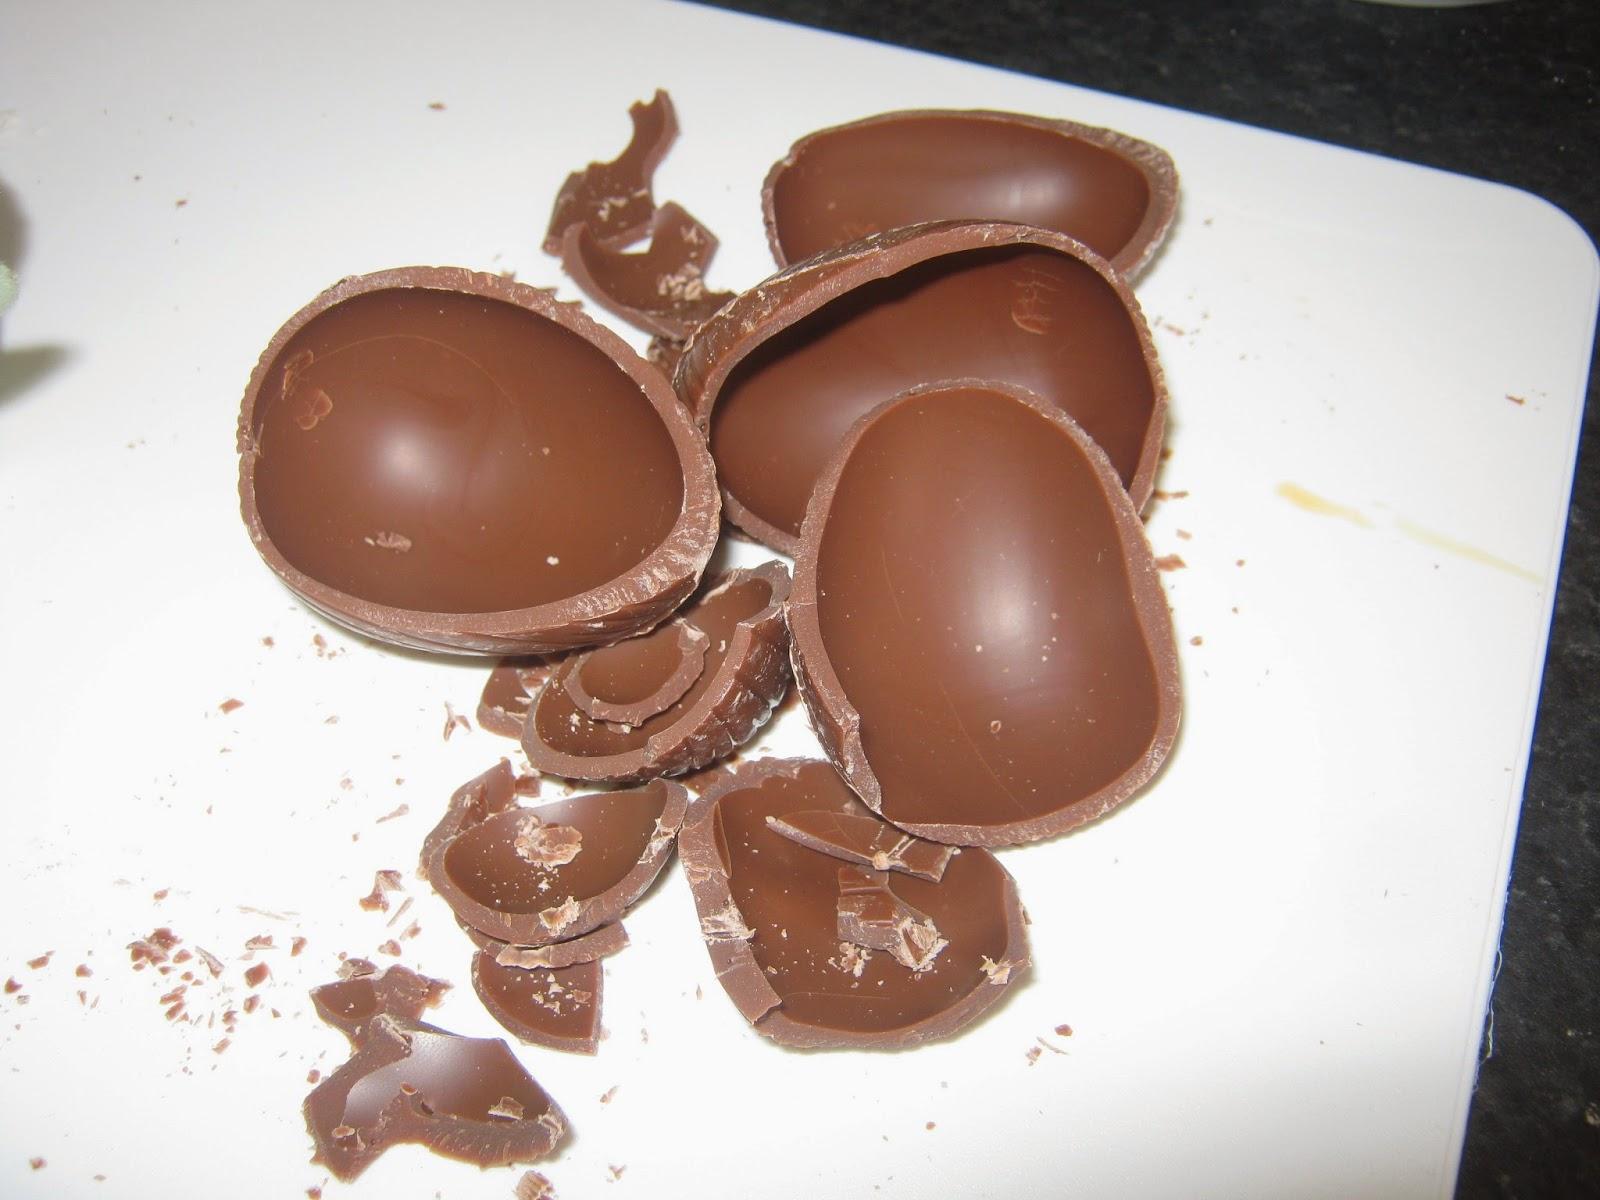 The accidentally broken chocolate eggs